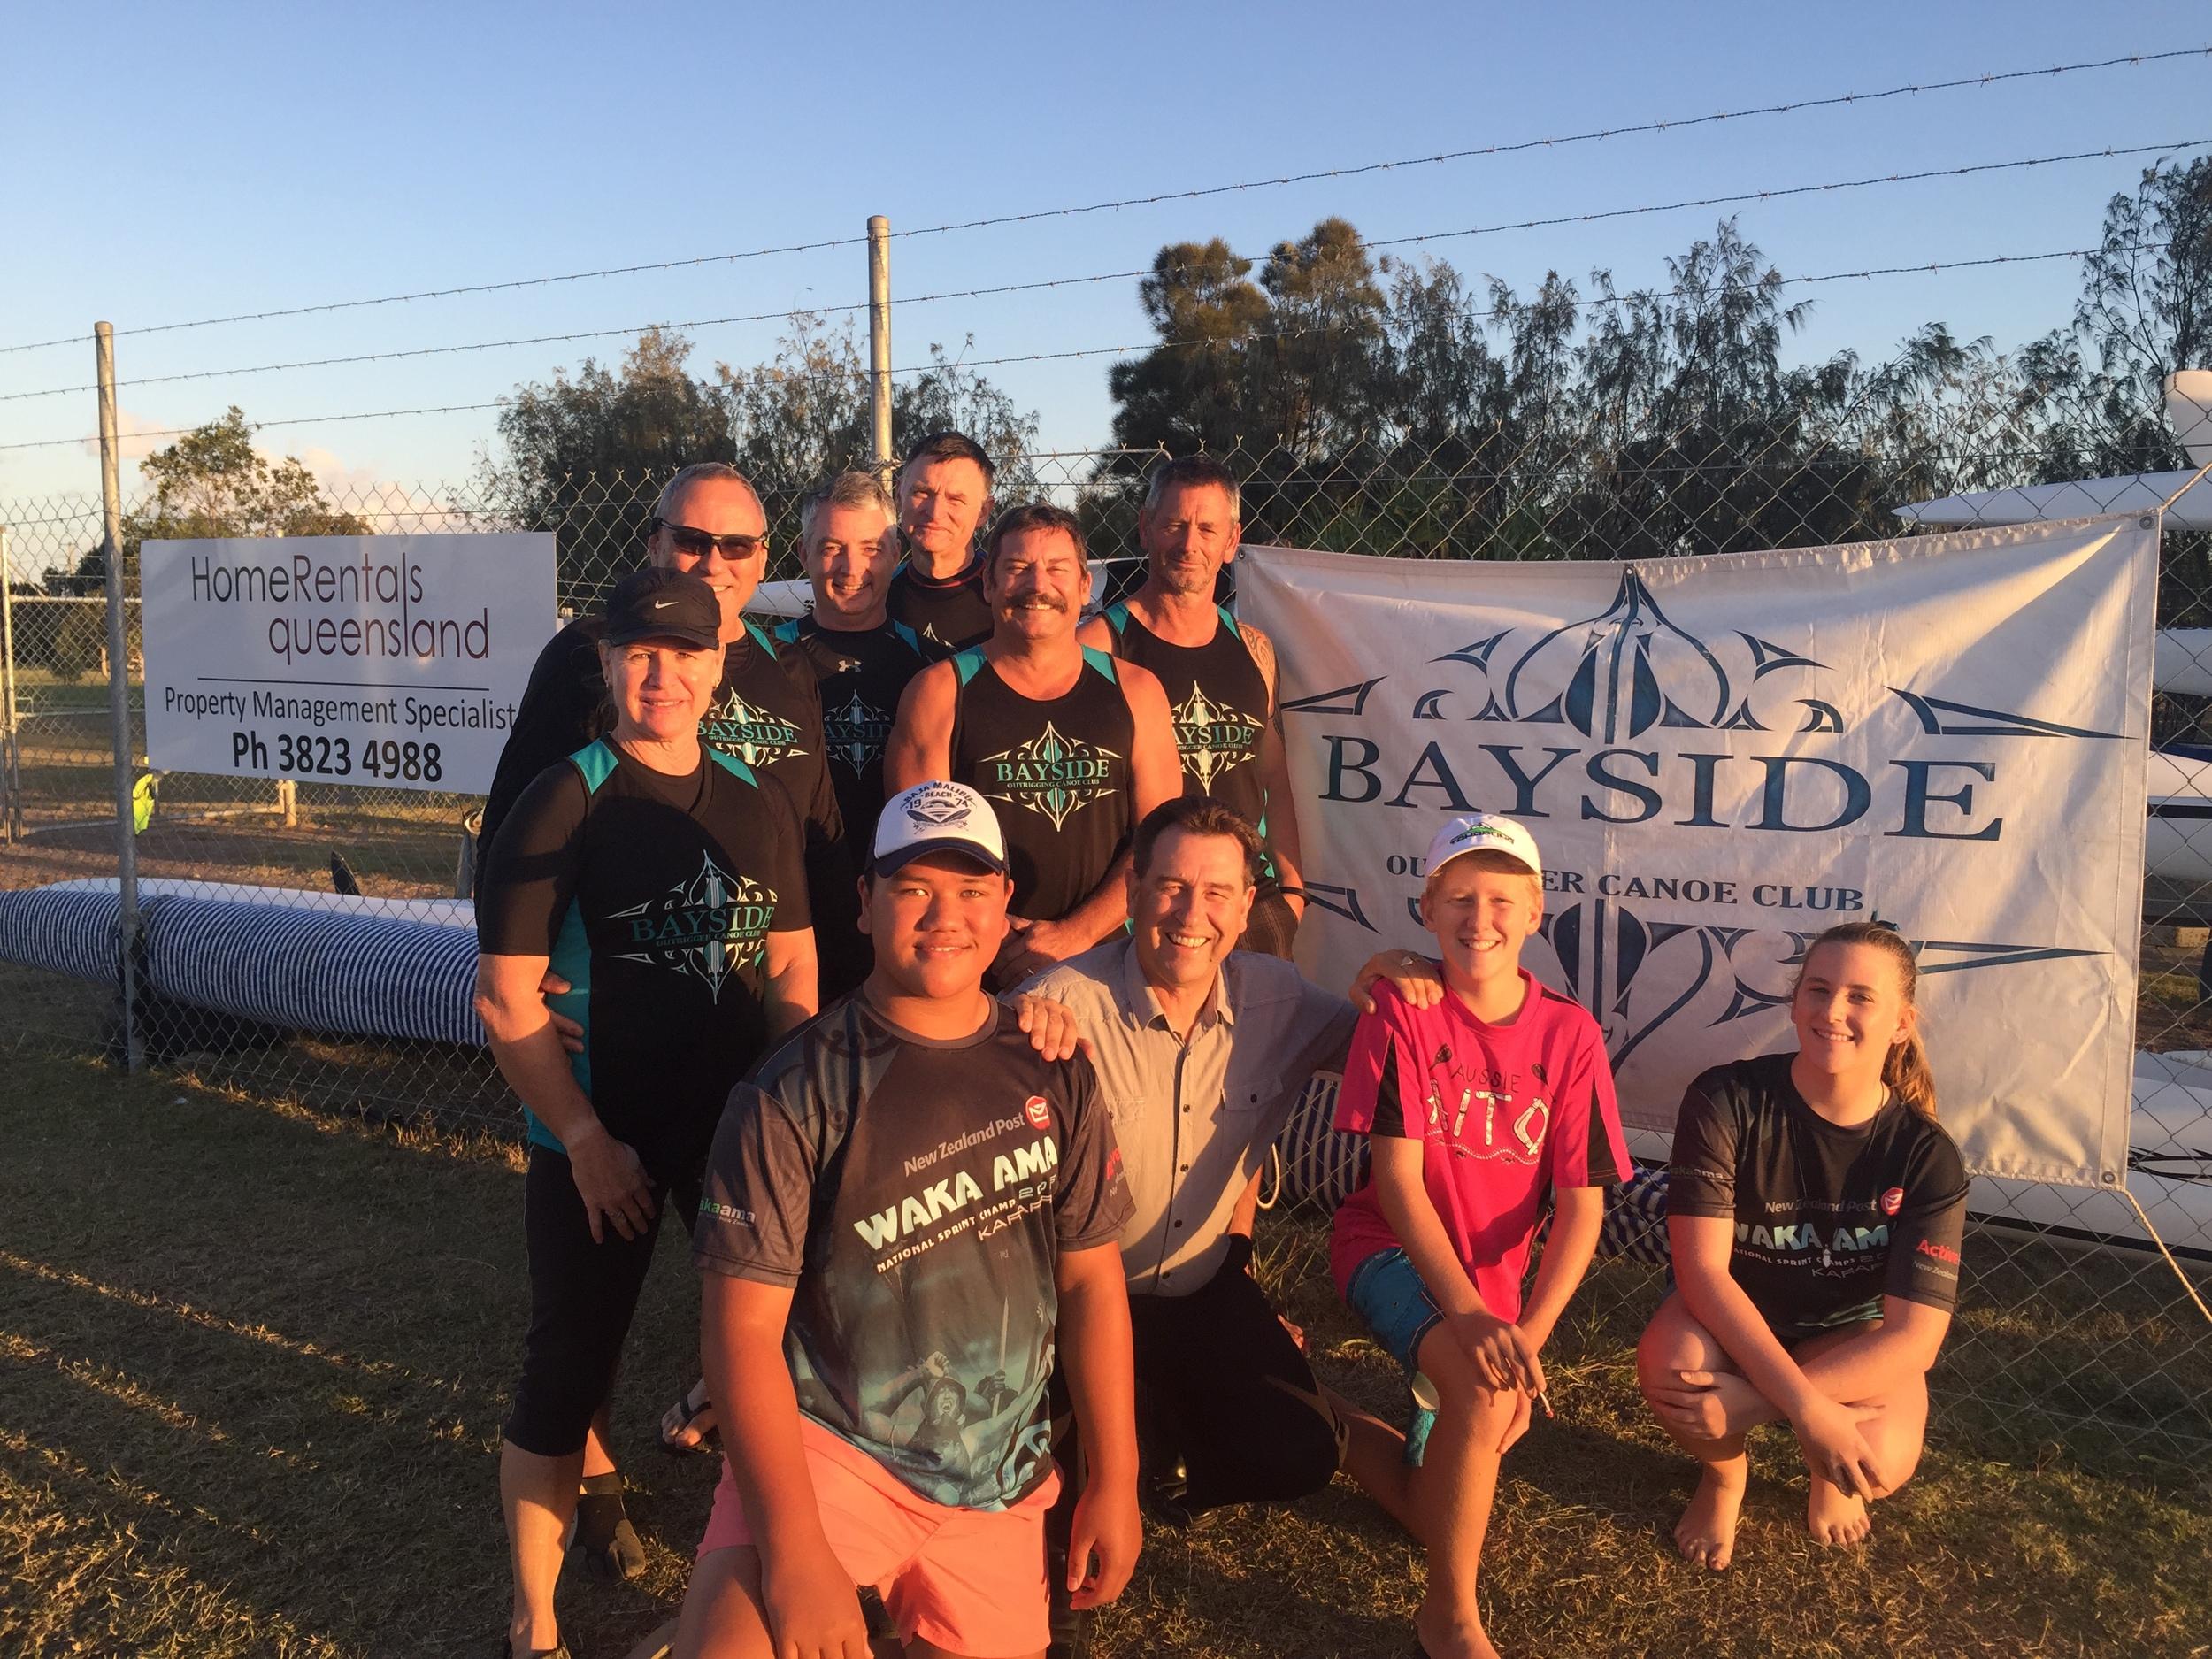 Bayside Outrigger Canoe Club